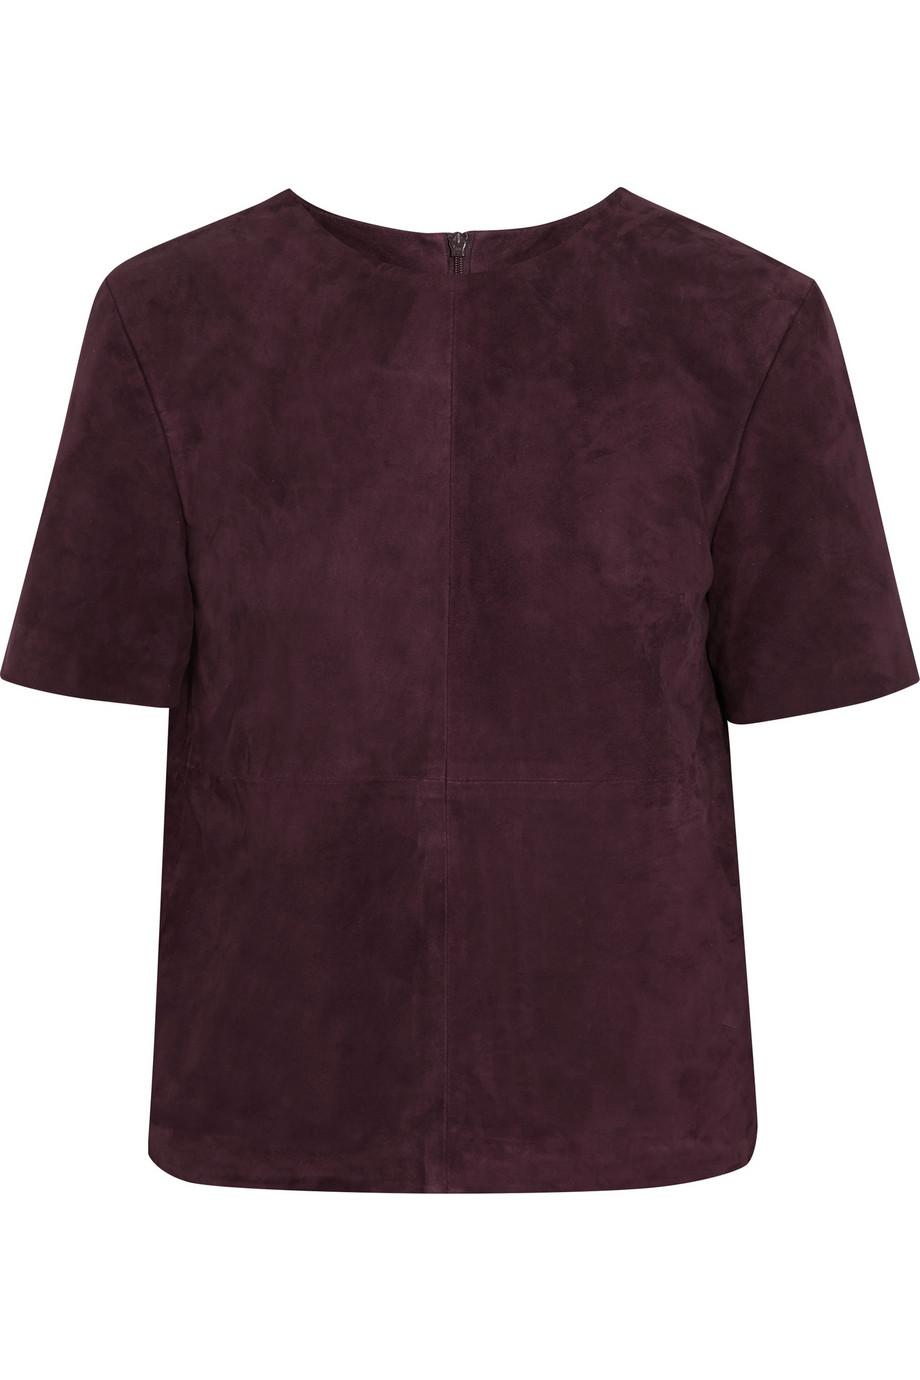 Iris & Ink - T-shirt(234 €)